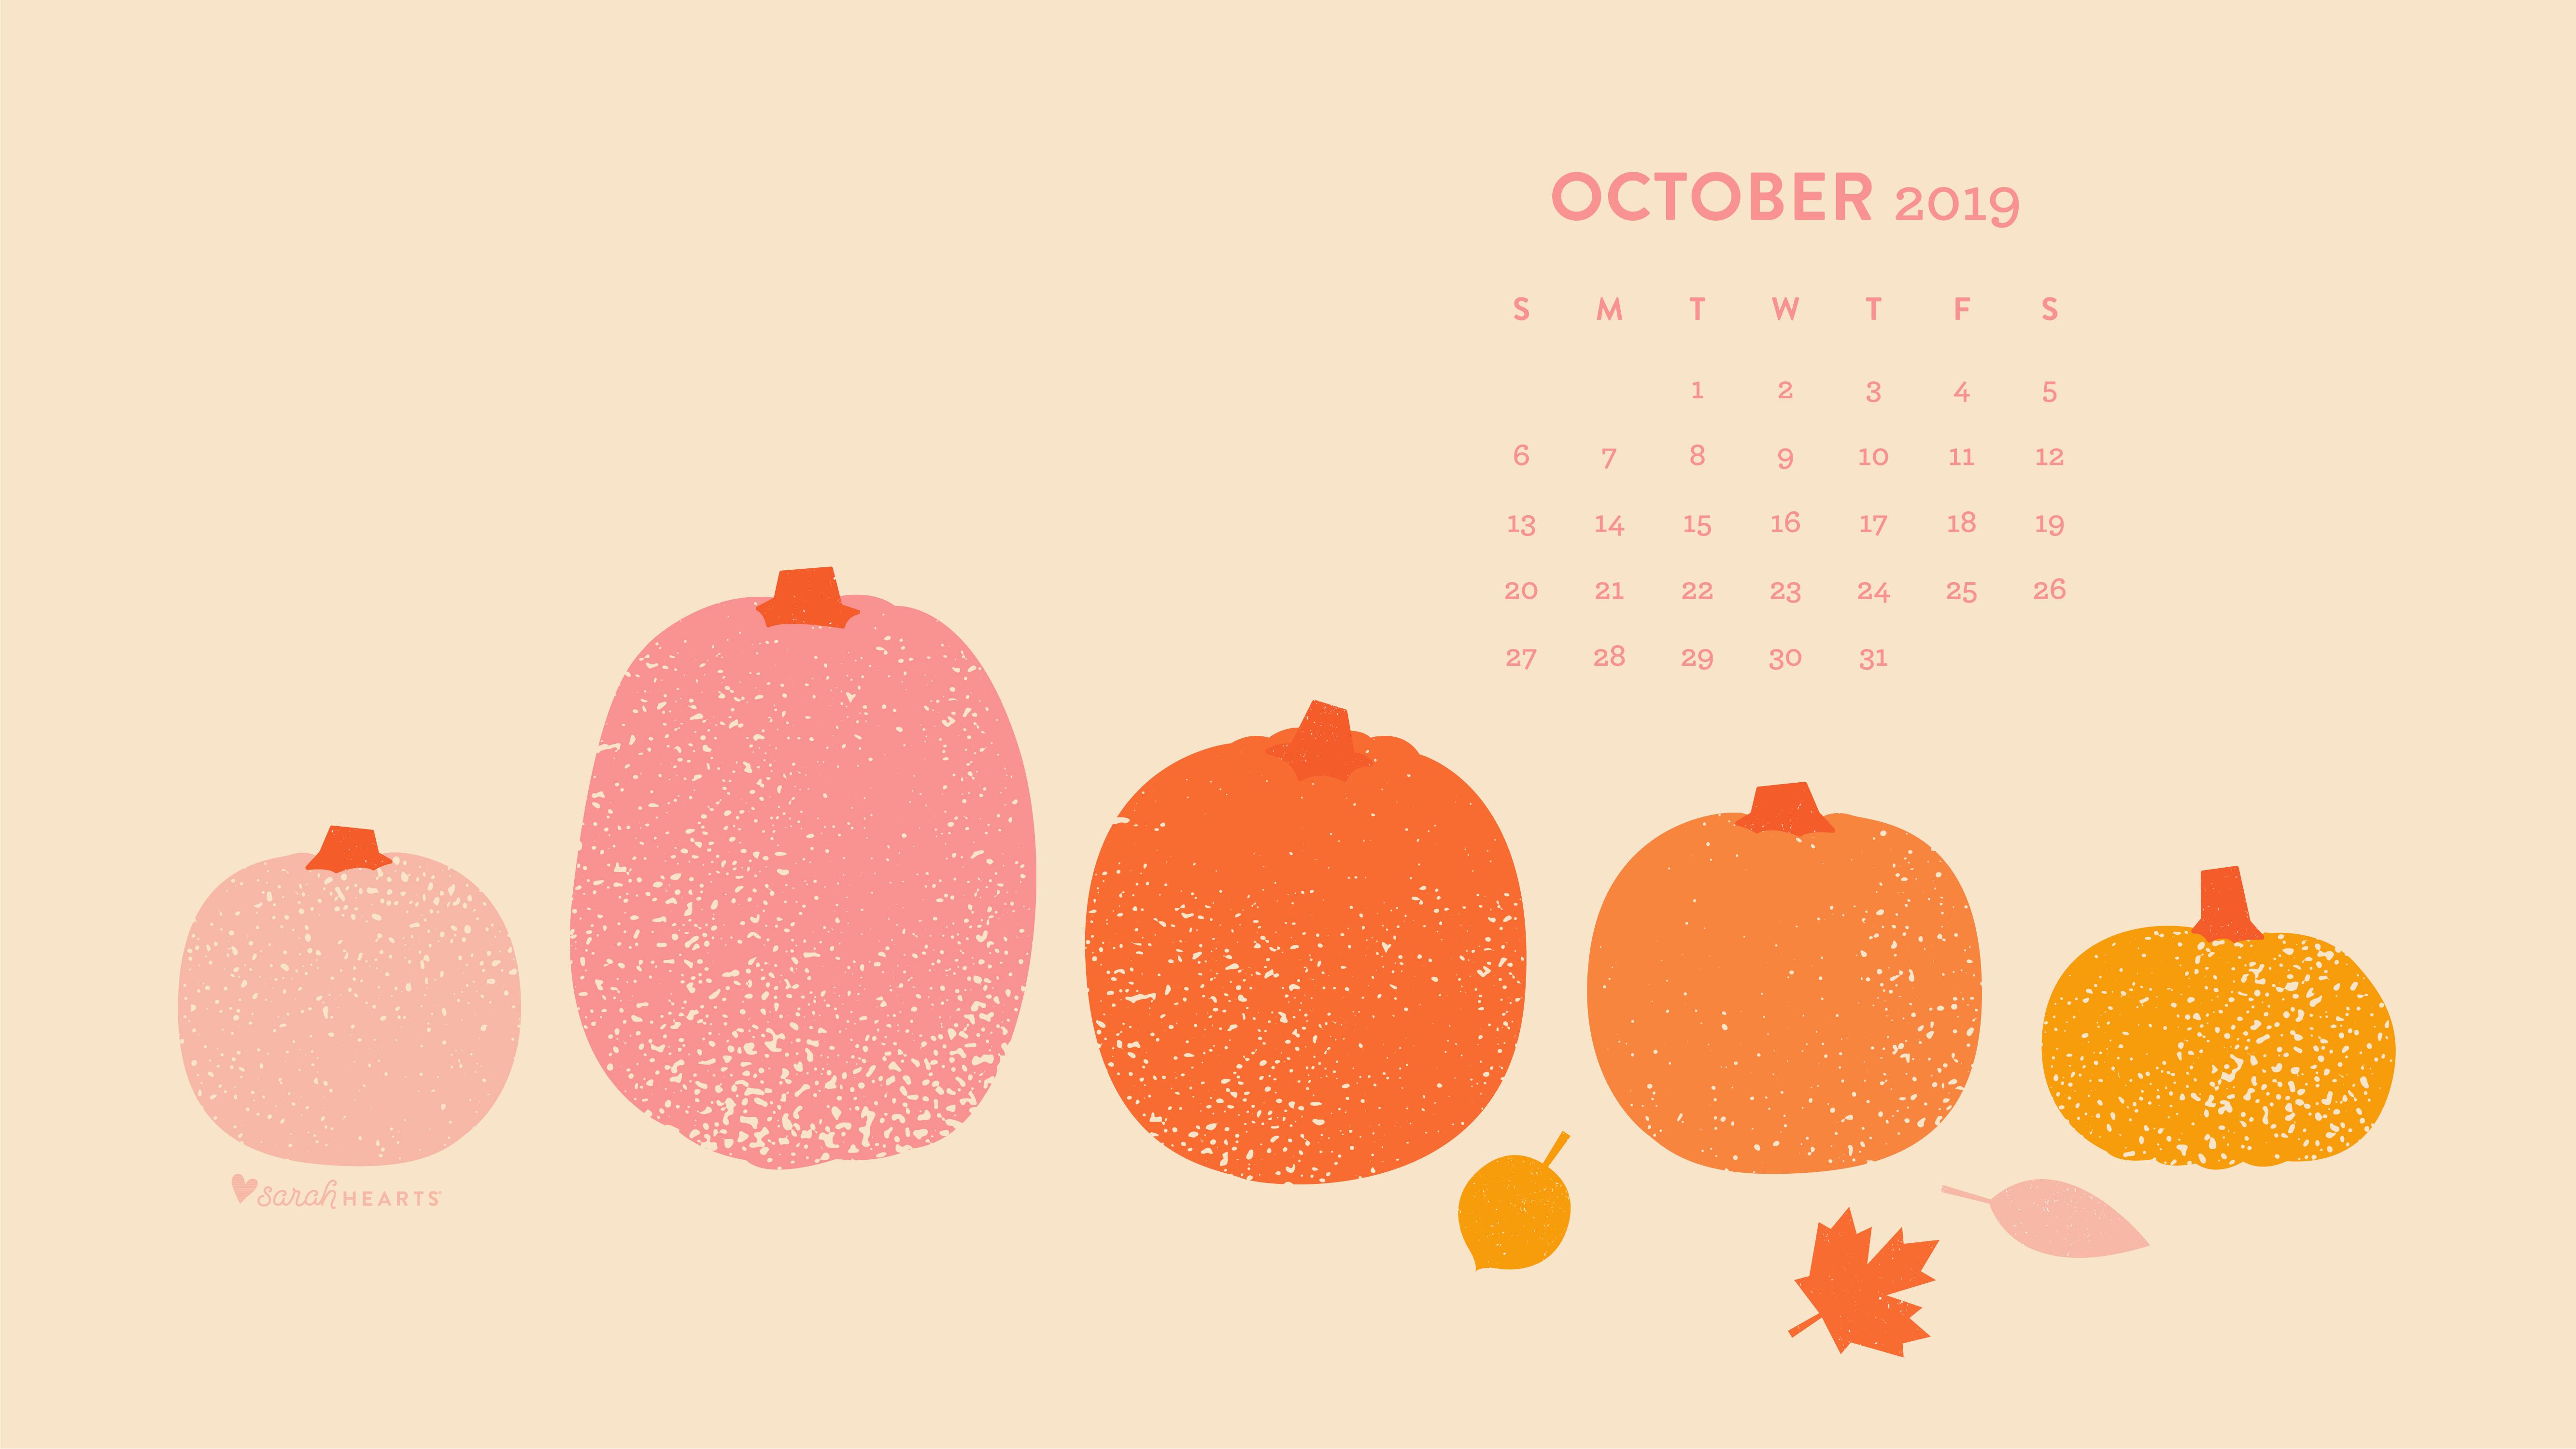 October 2019 Pumpkin Calendar Wallpaper   Sarah Hearts 5334x3001